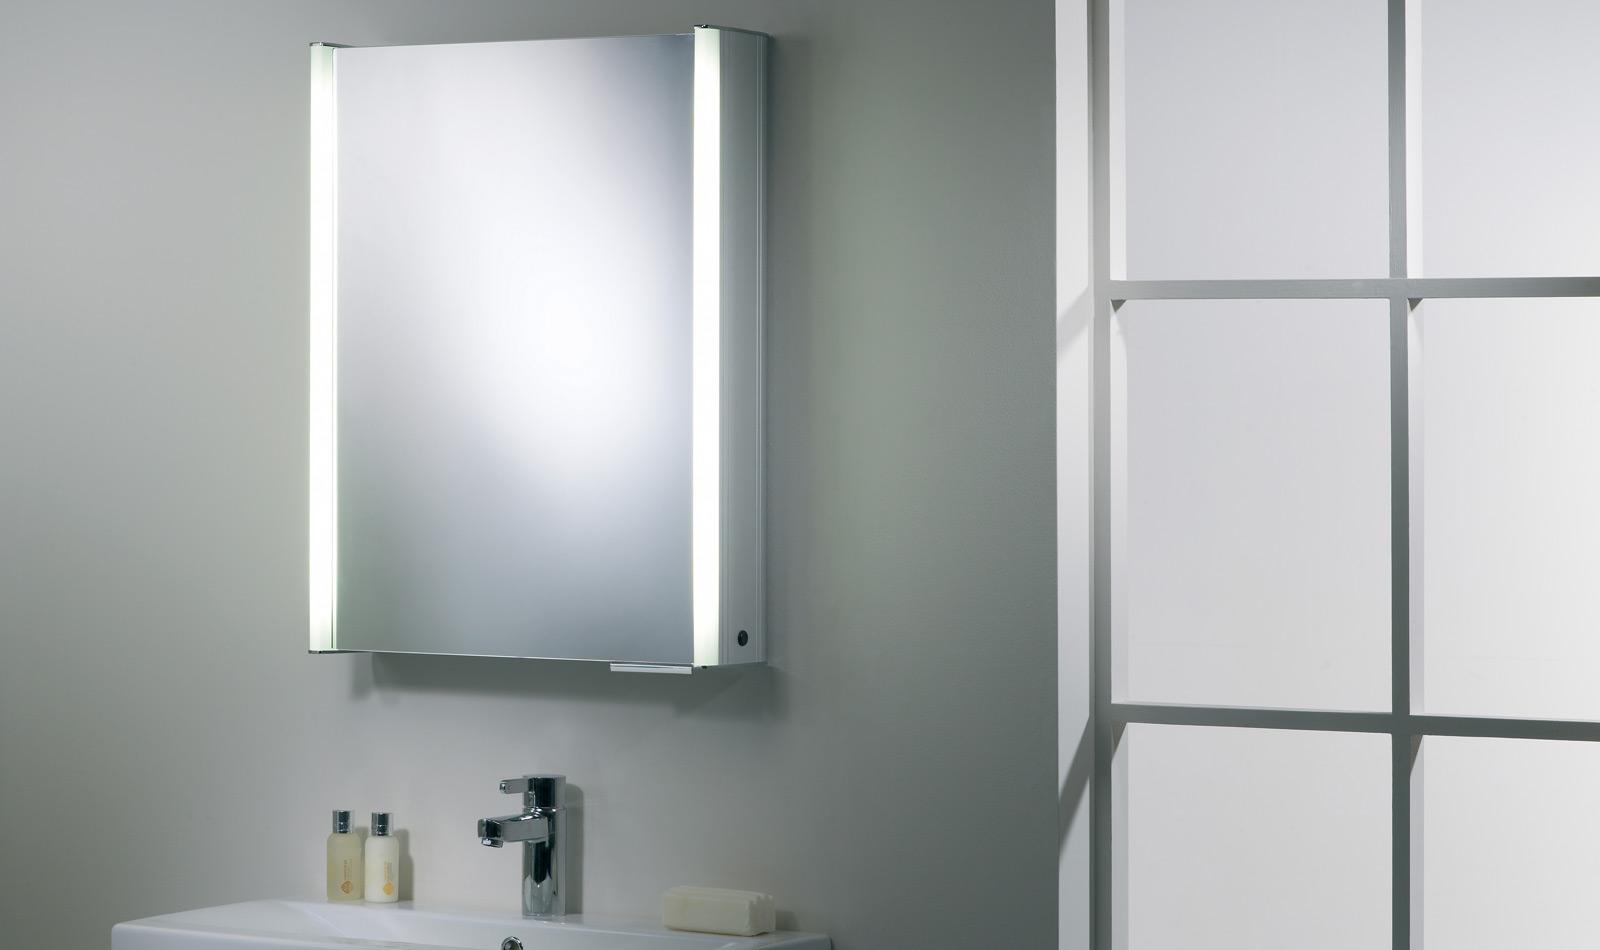 Instinct Mirror Cabinets Bathroom Solutions Oxfordshire